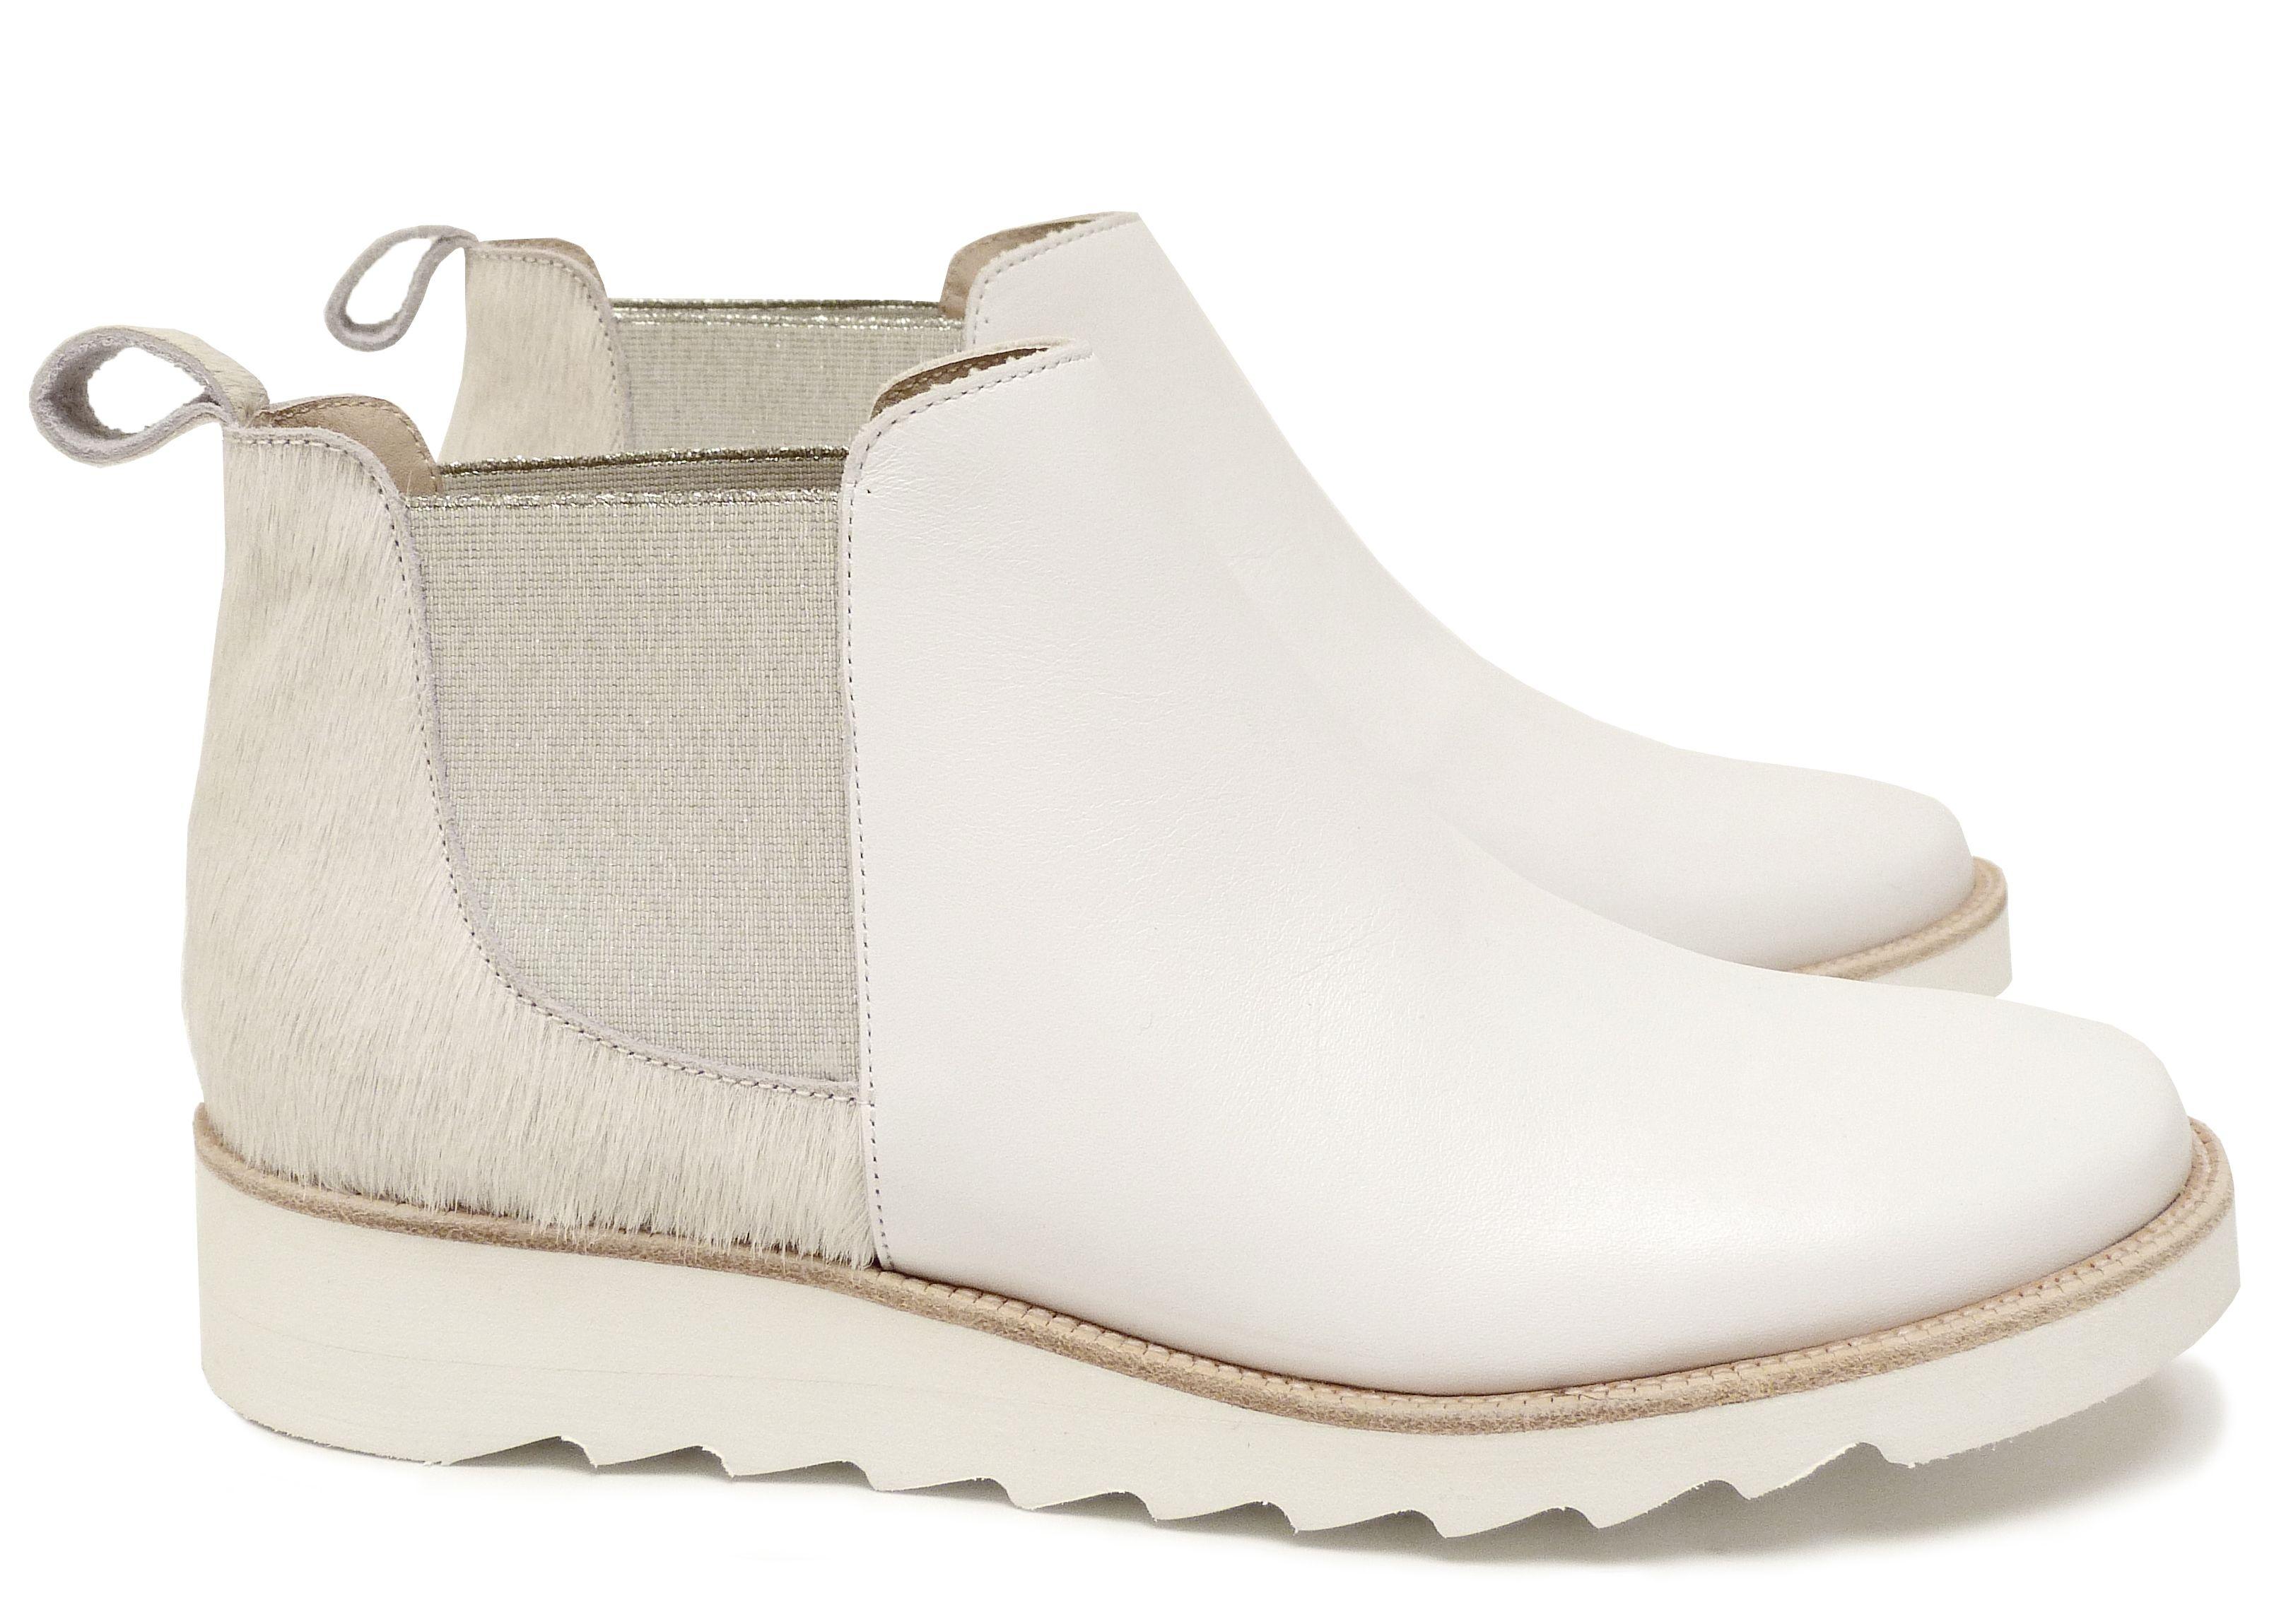 Chaussure Femme Boots Printemps Ete 2015 Maurice Manufacture BRENDA Cuir poil ras ecru - veau lisse blanc